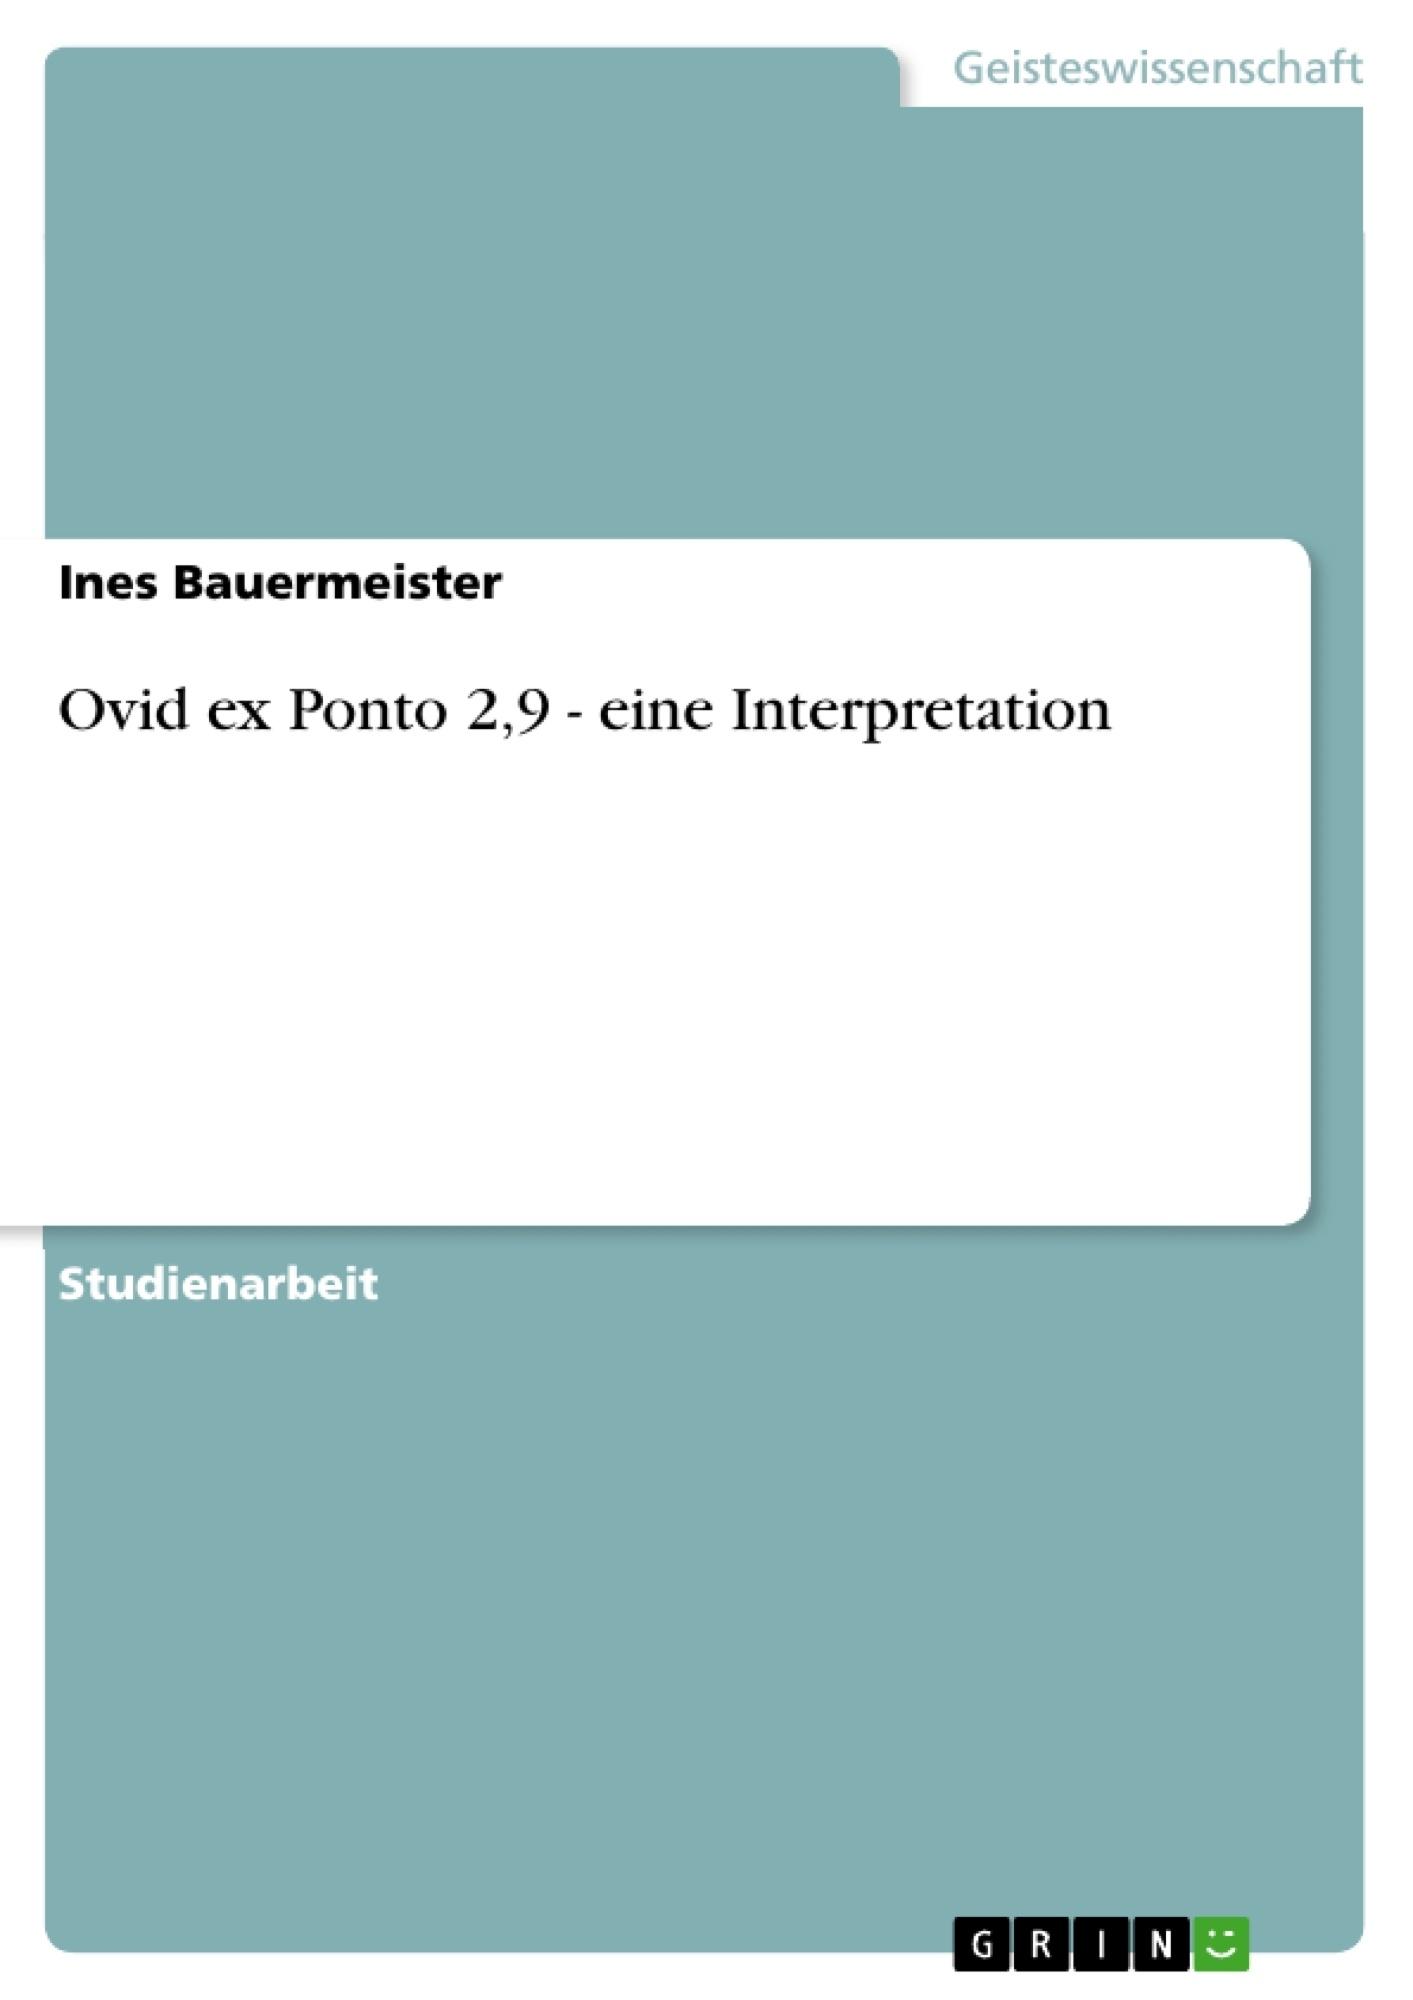 Titel: Ovid ex Ponto 2,9 - eine Interpretation